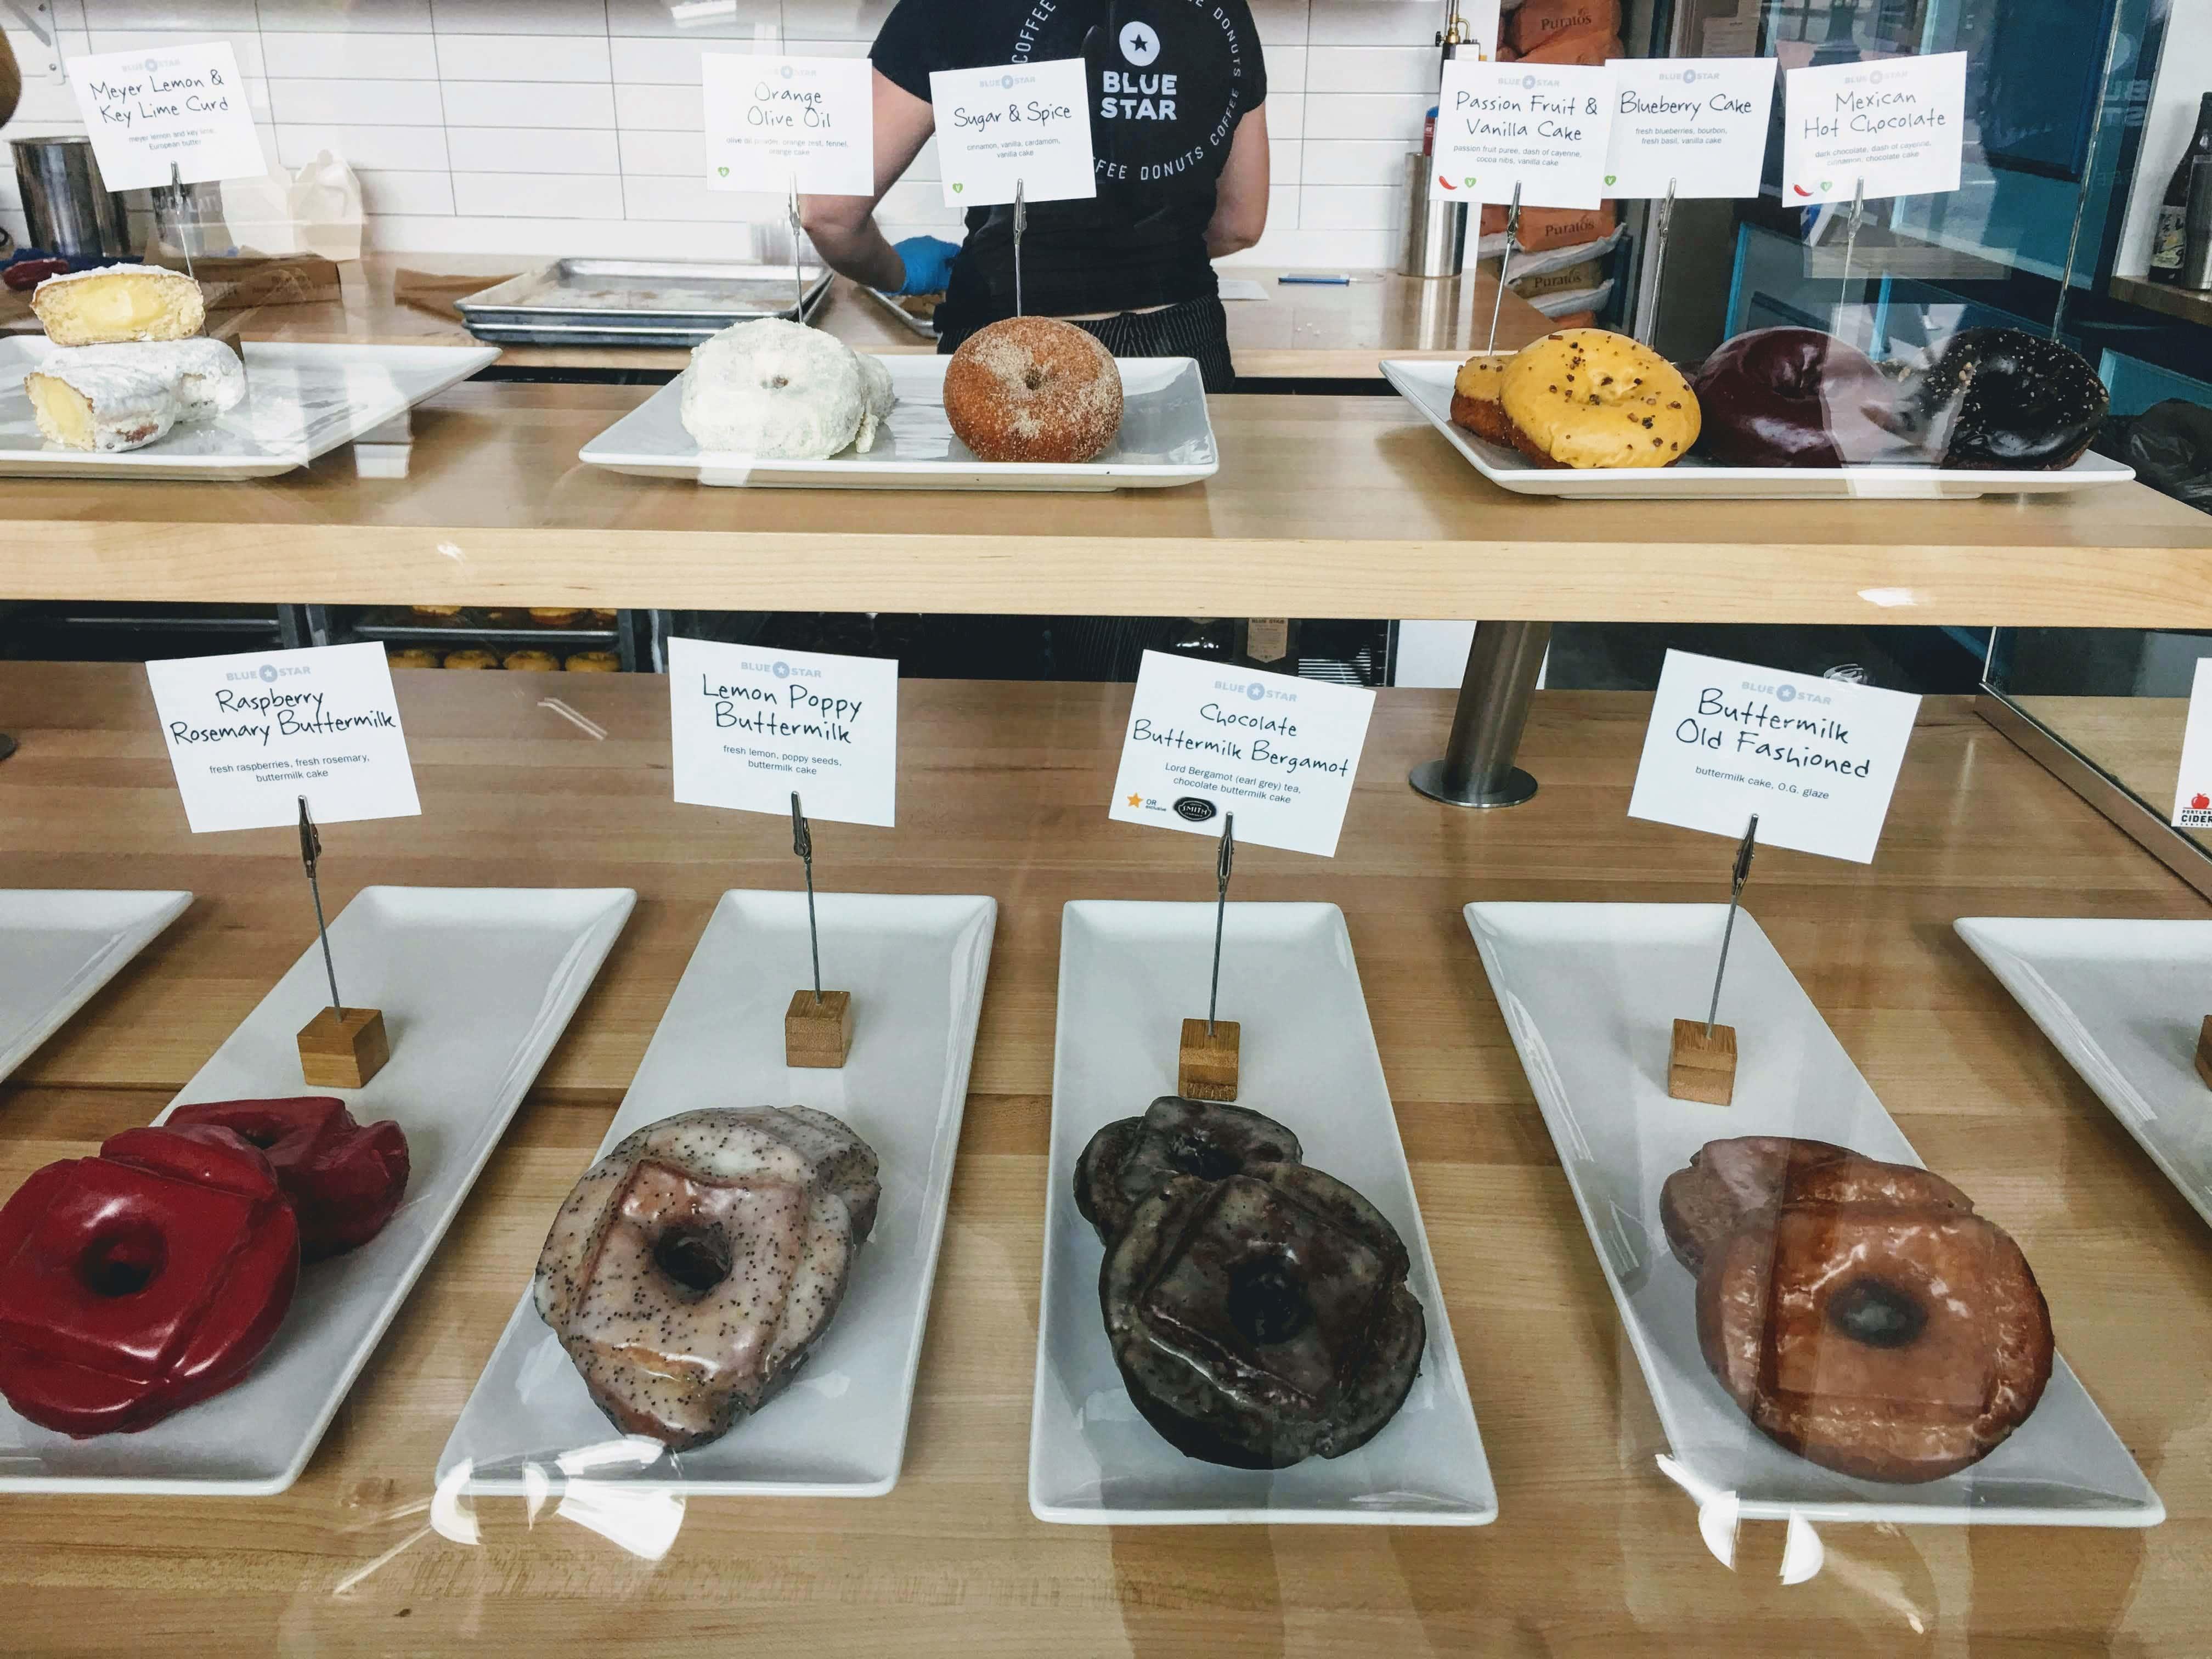 blue star donuts Portland, Oregon display